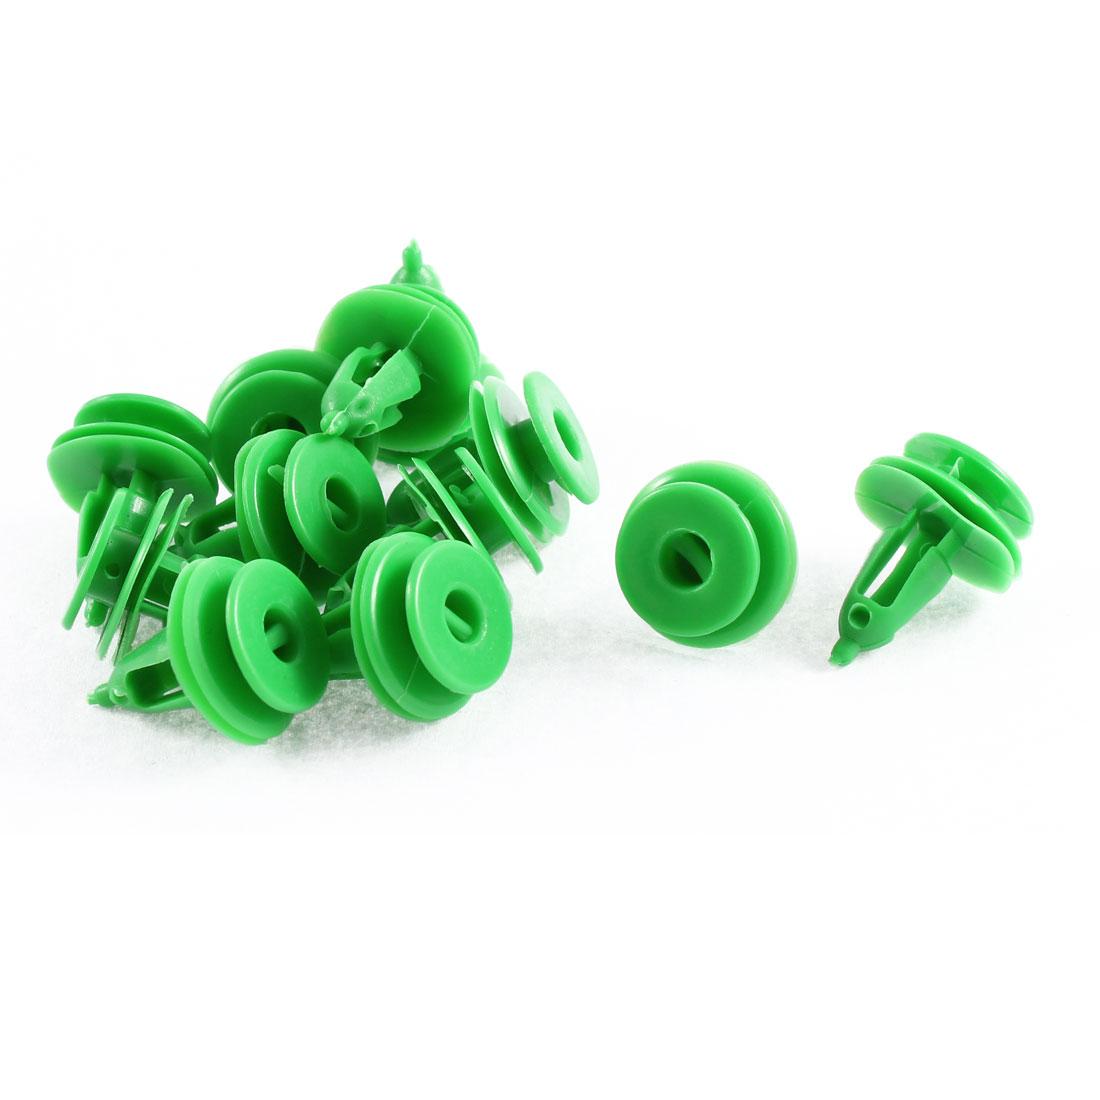 12Pcs Green Push-Type Trim Moulding Plastic Retainer 7 x 17 x 16mm